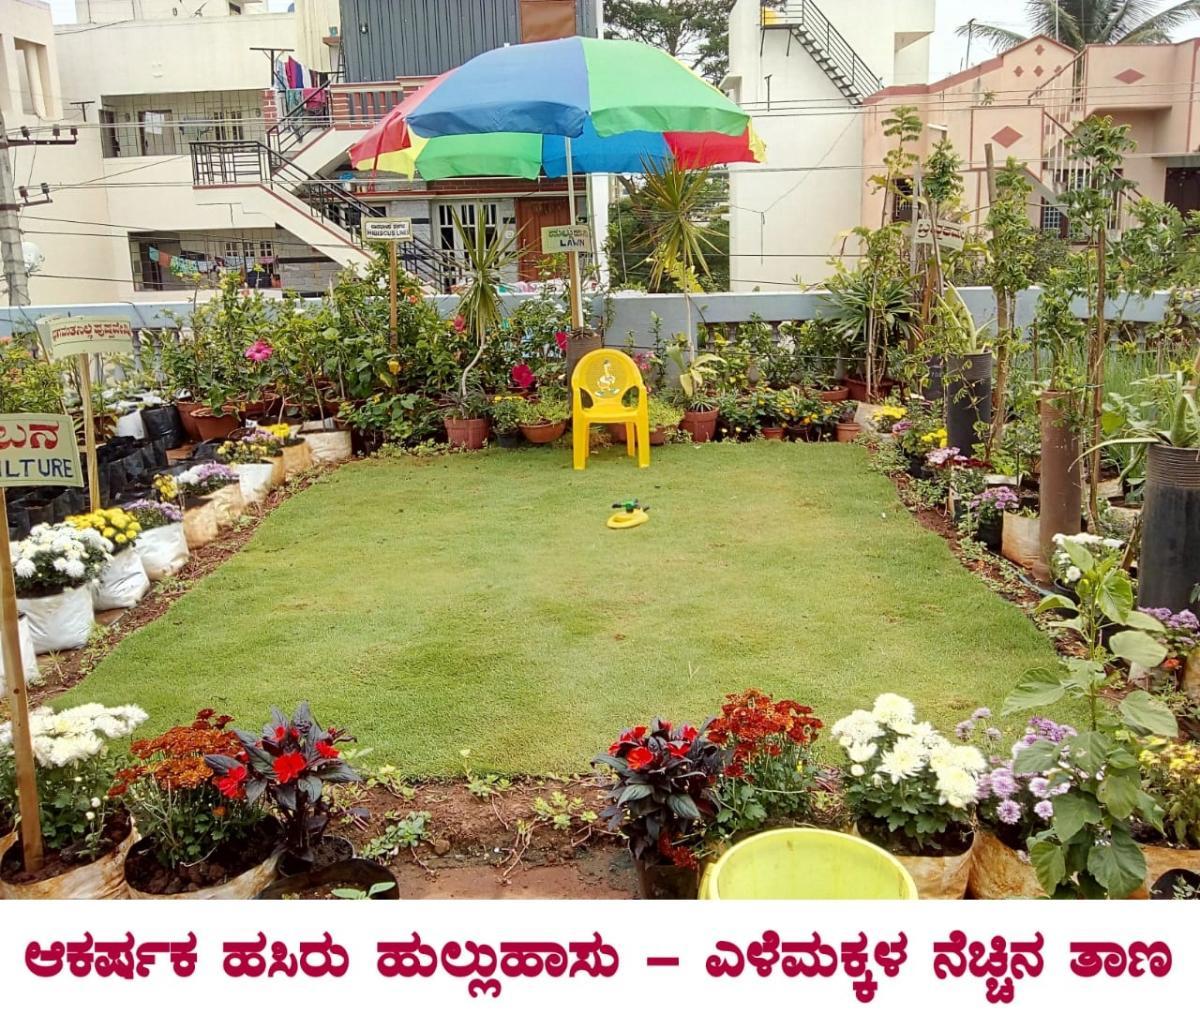 In Mysuru Terrace Garden Of A Rare Kind Deccan Herald